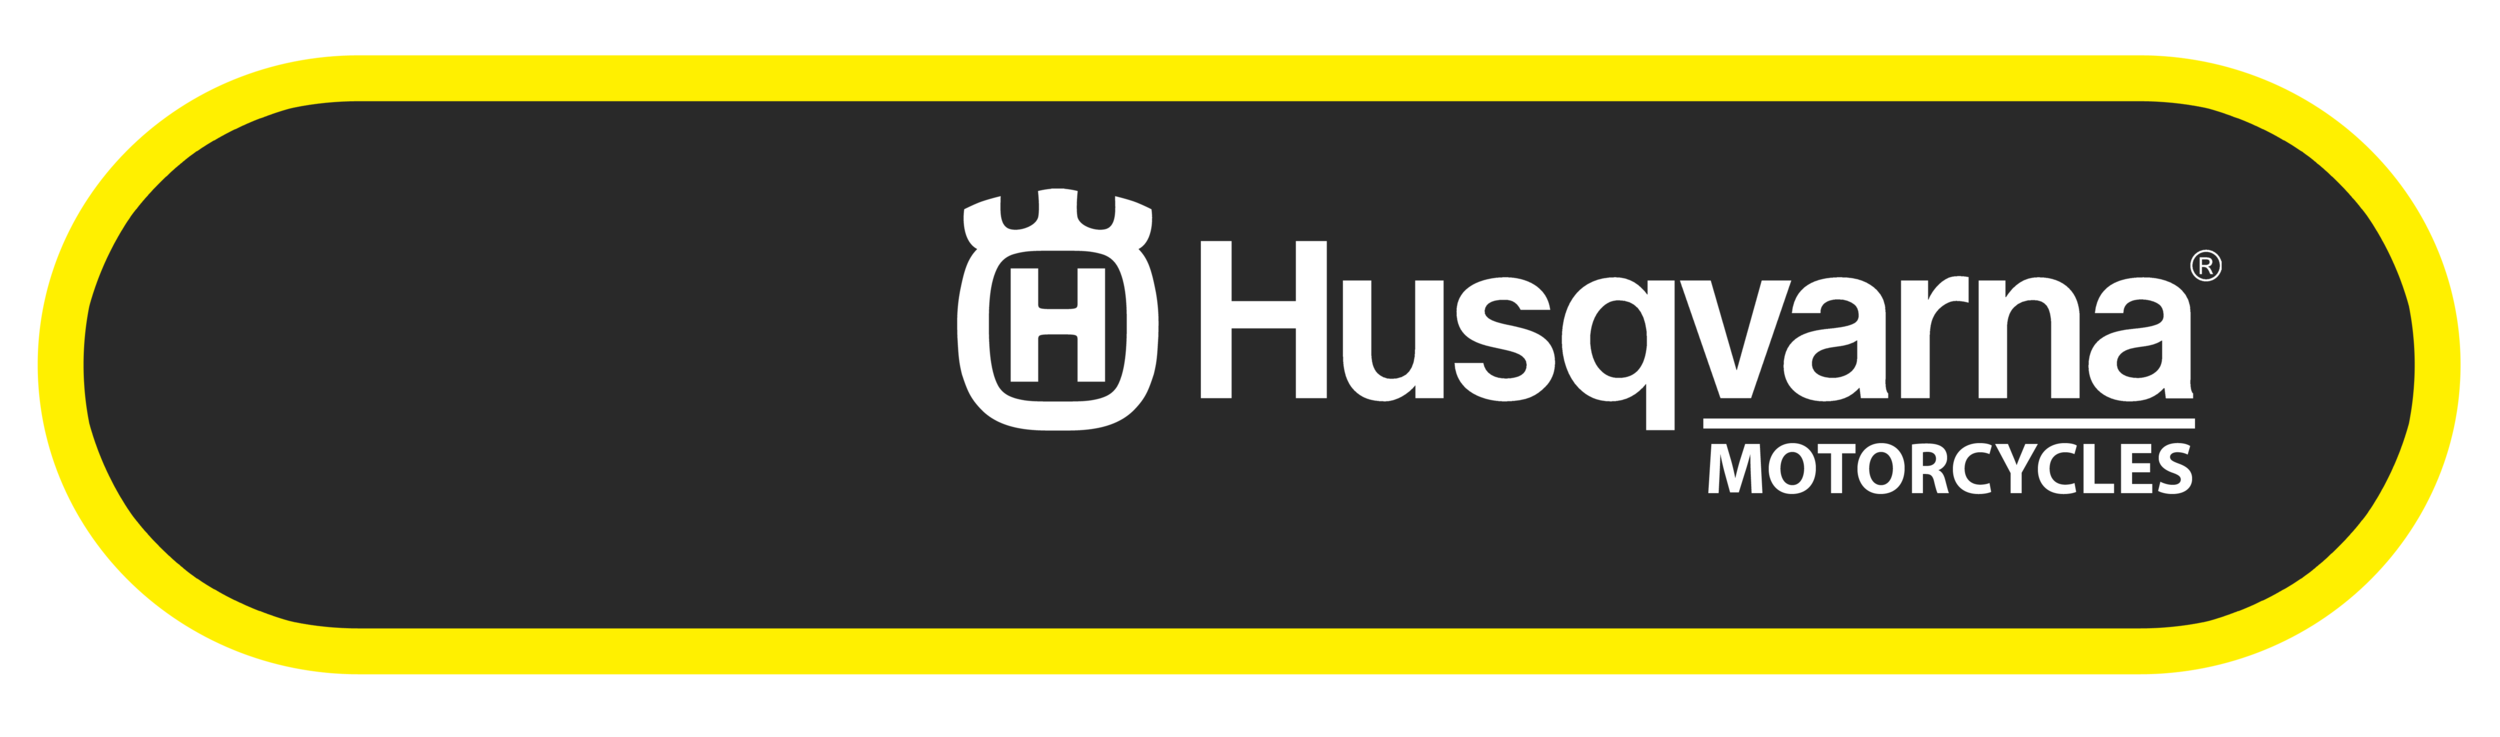 logo-Husqvarna.png